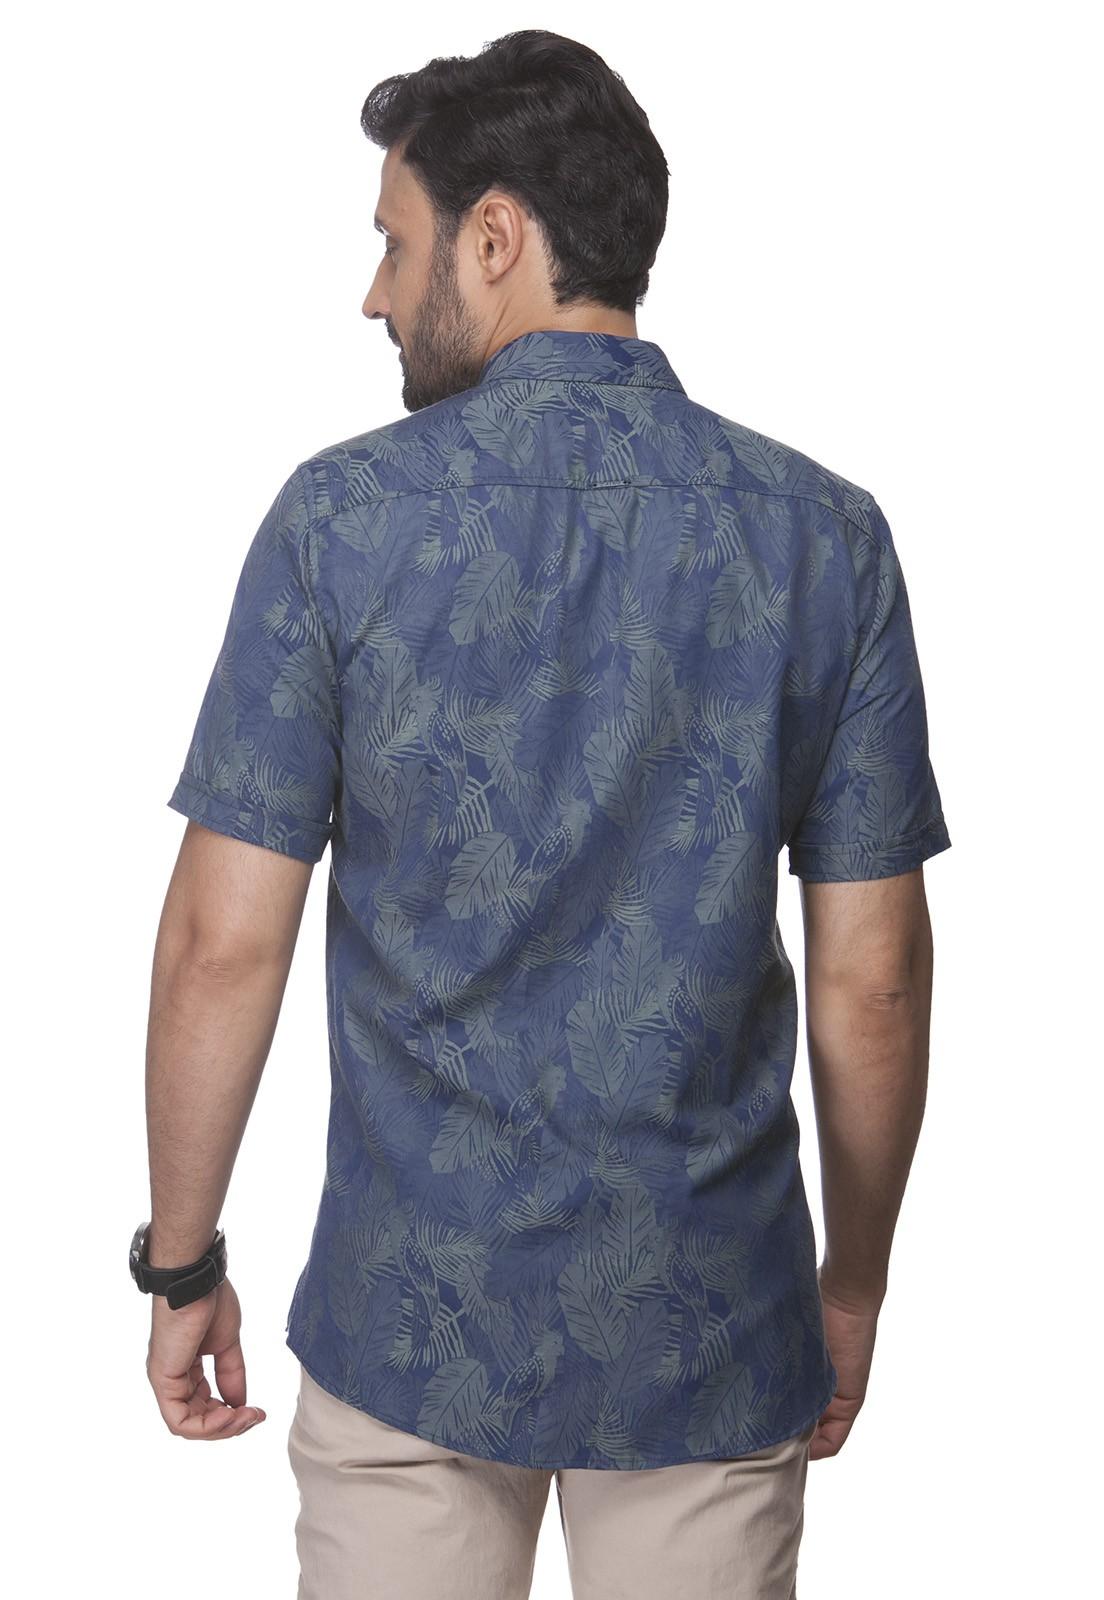 Camisa Fit Zaiko Jacquard Manga Curta 2339